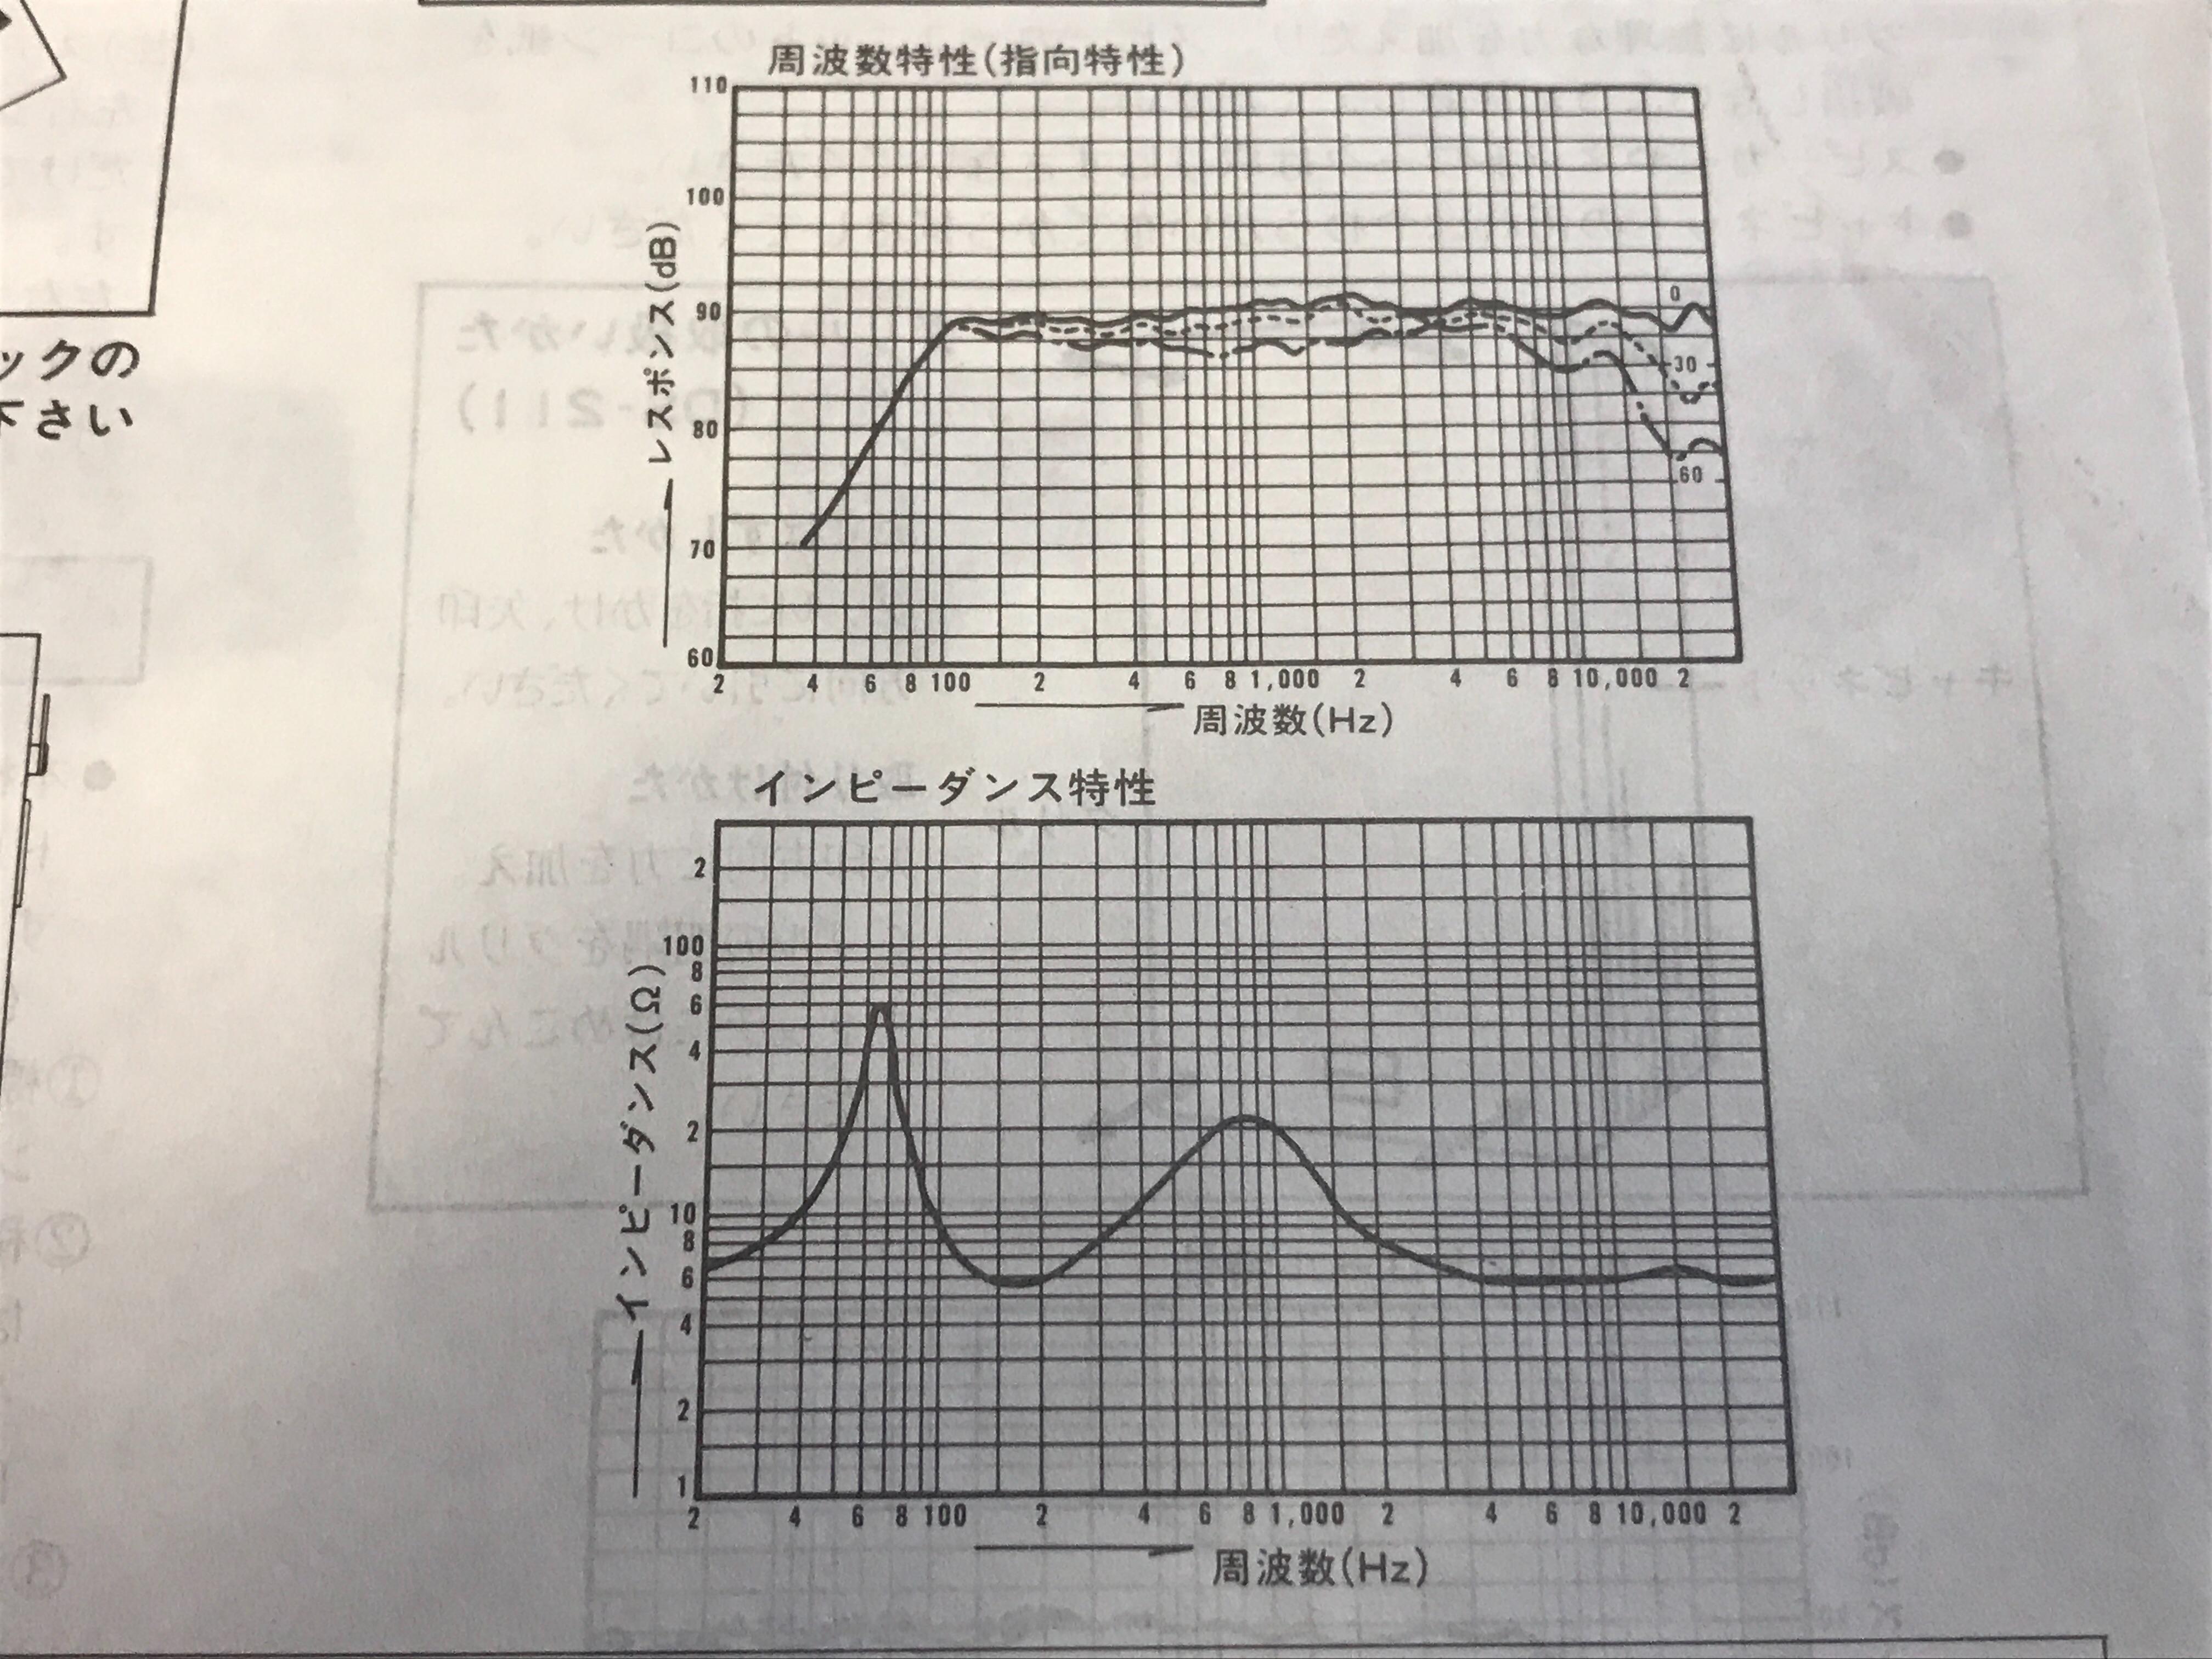 f:id:SeisoSakuya:20210504224410j:plain